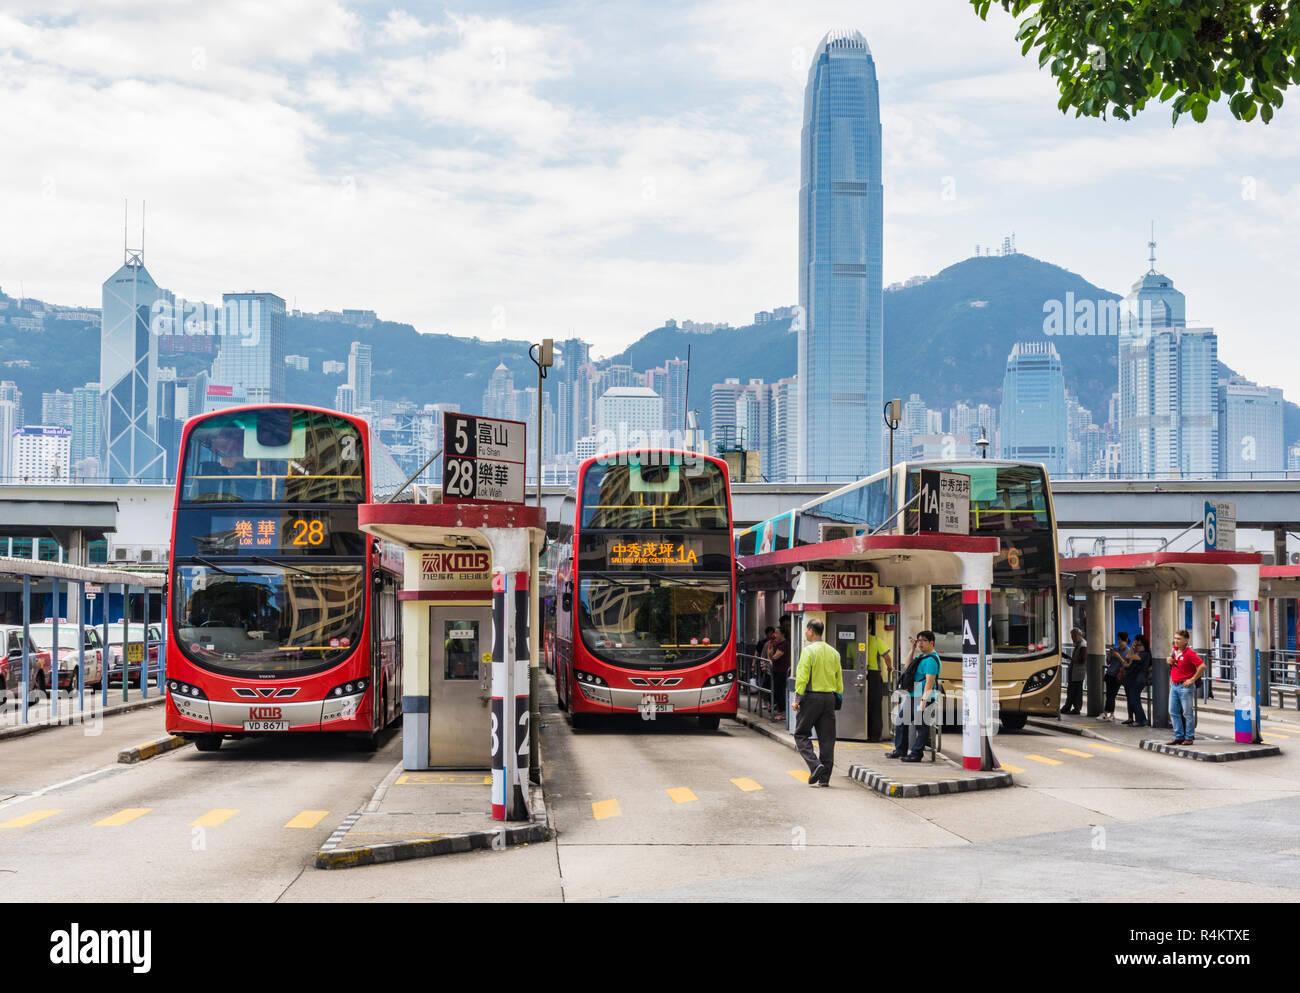 KMB Bus Station, Tsim Sha Tsui, Kowloon, Hong Kong - Stock Image